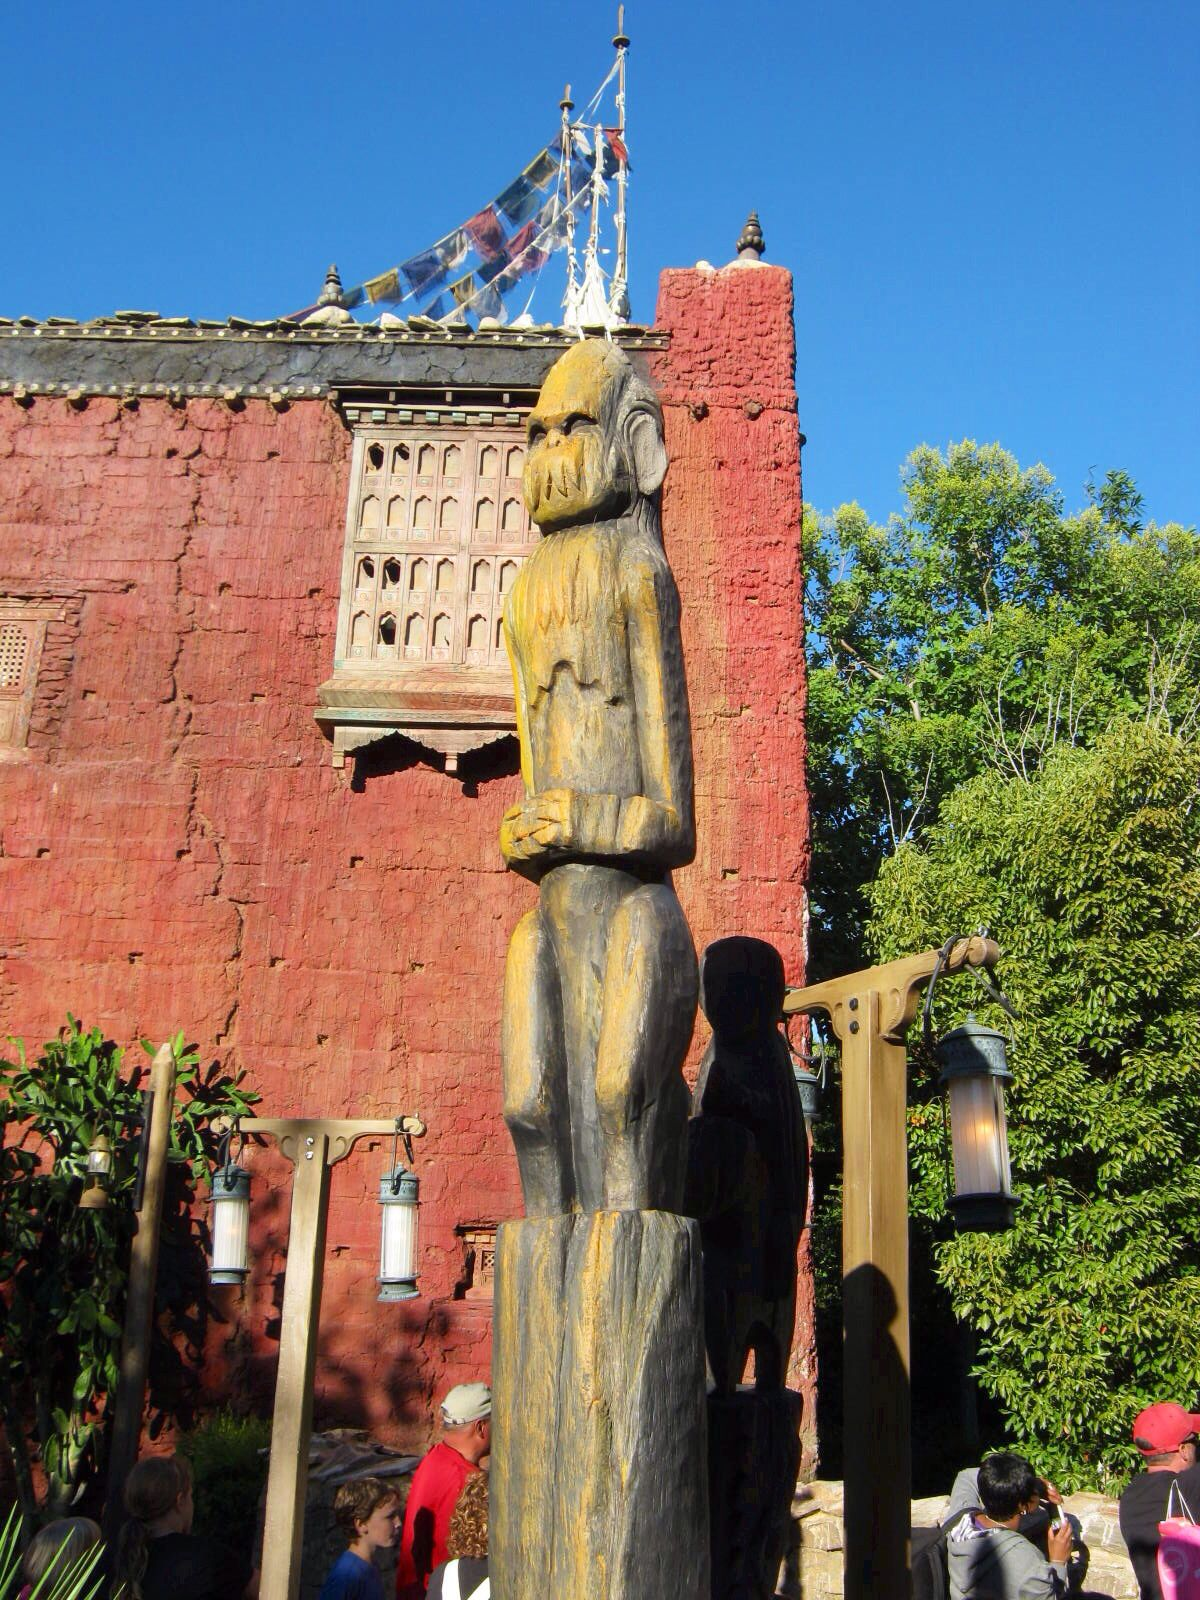 Expedition everest statues animal kingdom disneyland